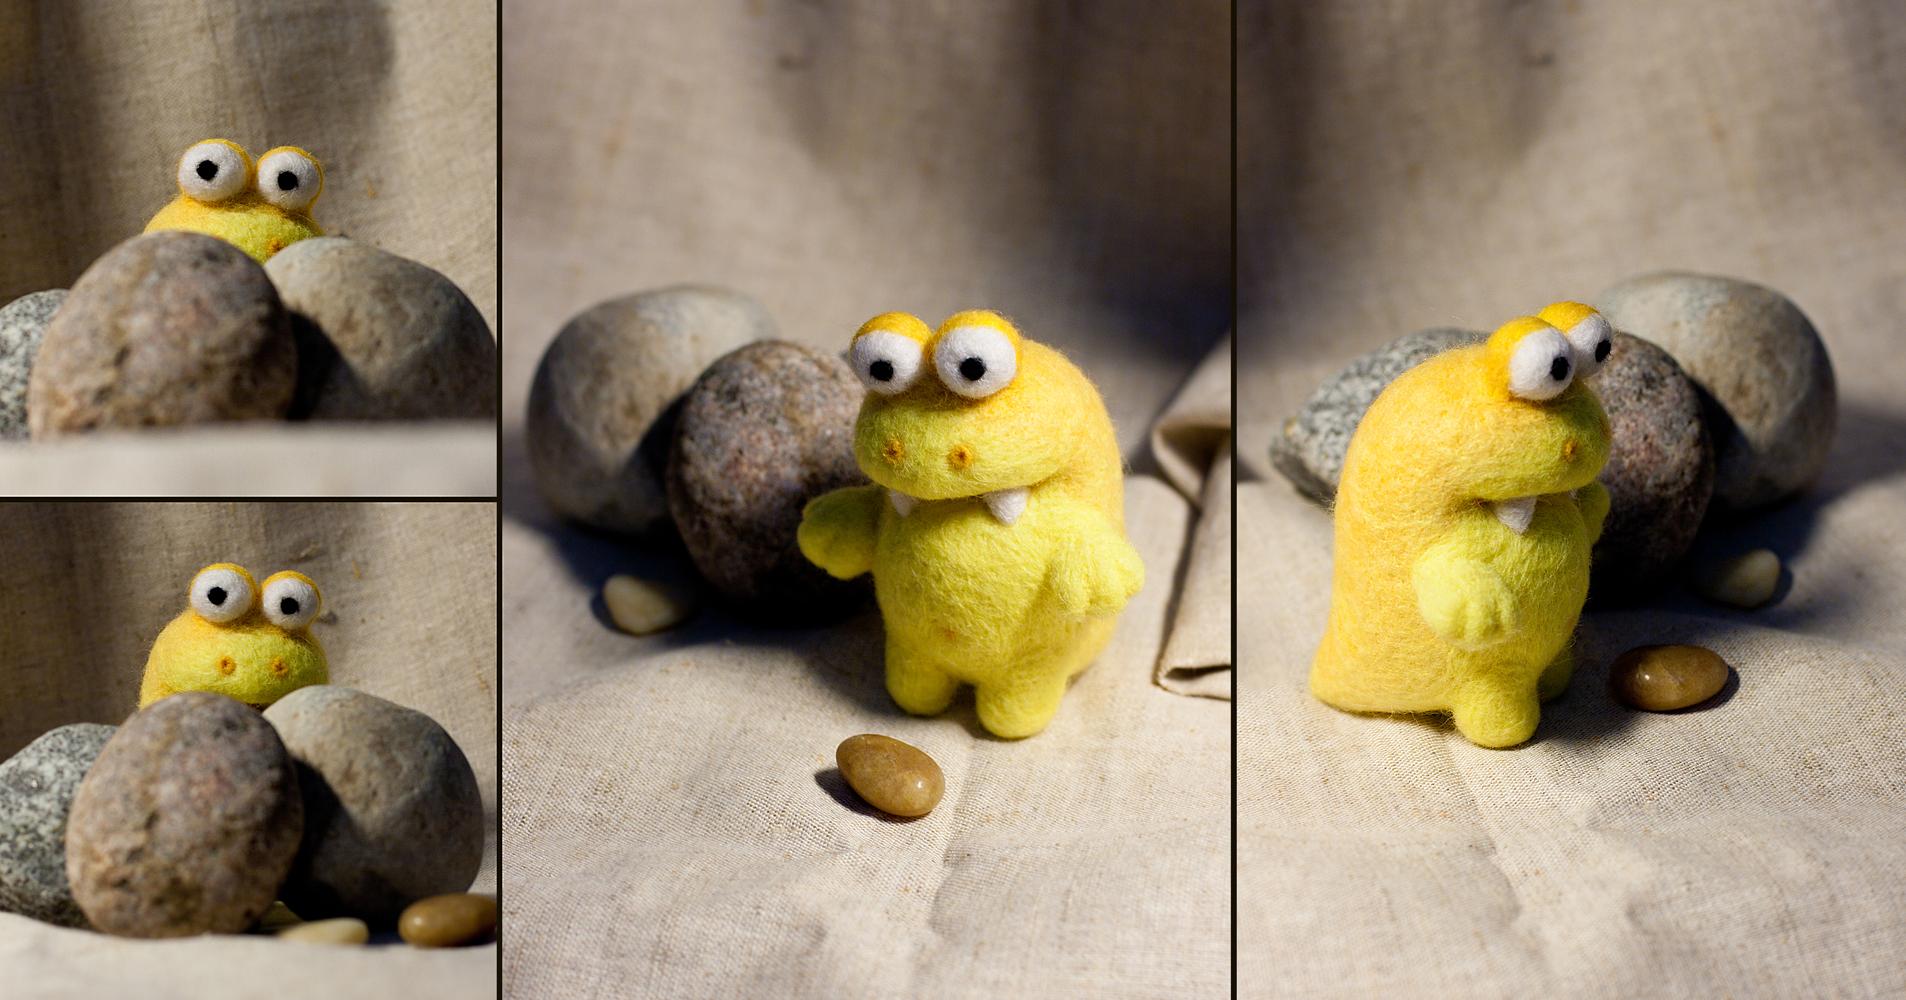 Mini-tyrannosaurus by Mimiori